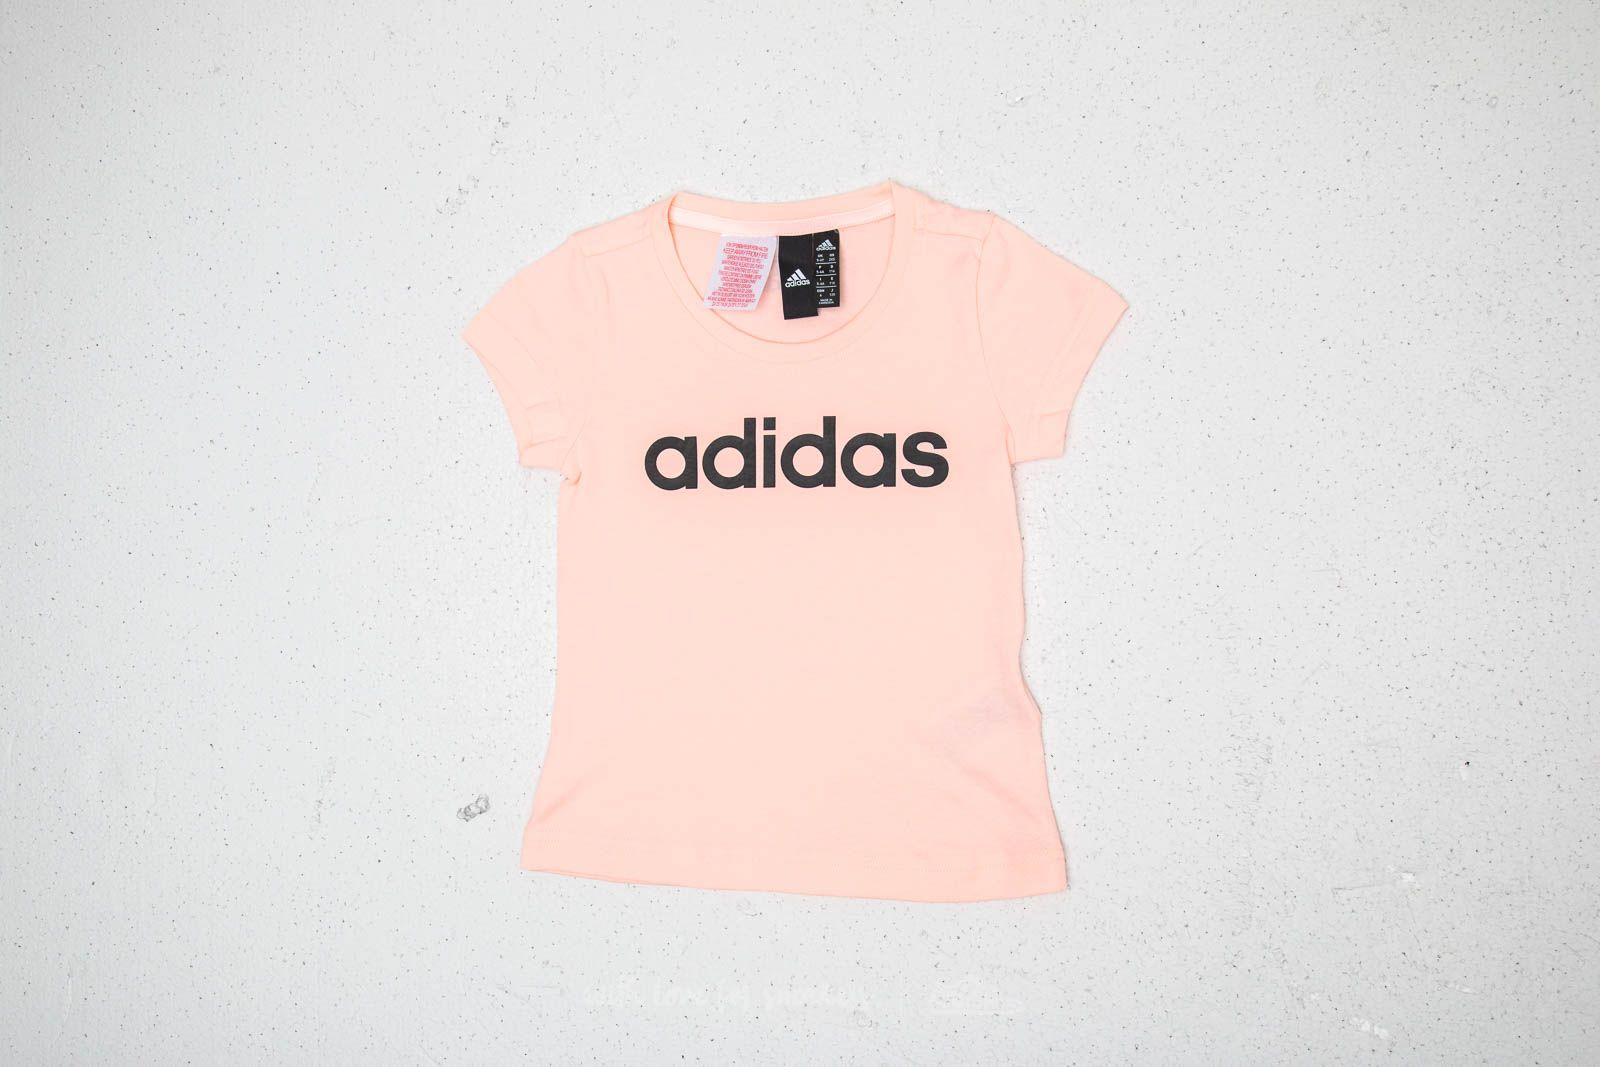 adidas Essentials Linear Tee Pink za skvělou cenu 279 Kč koupíte na Footshop.cz